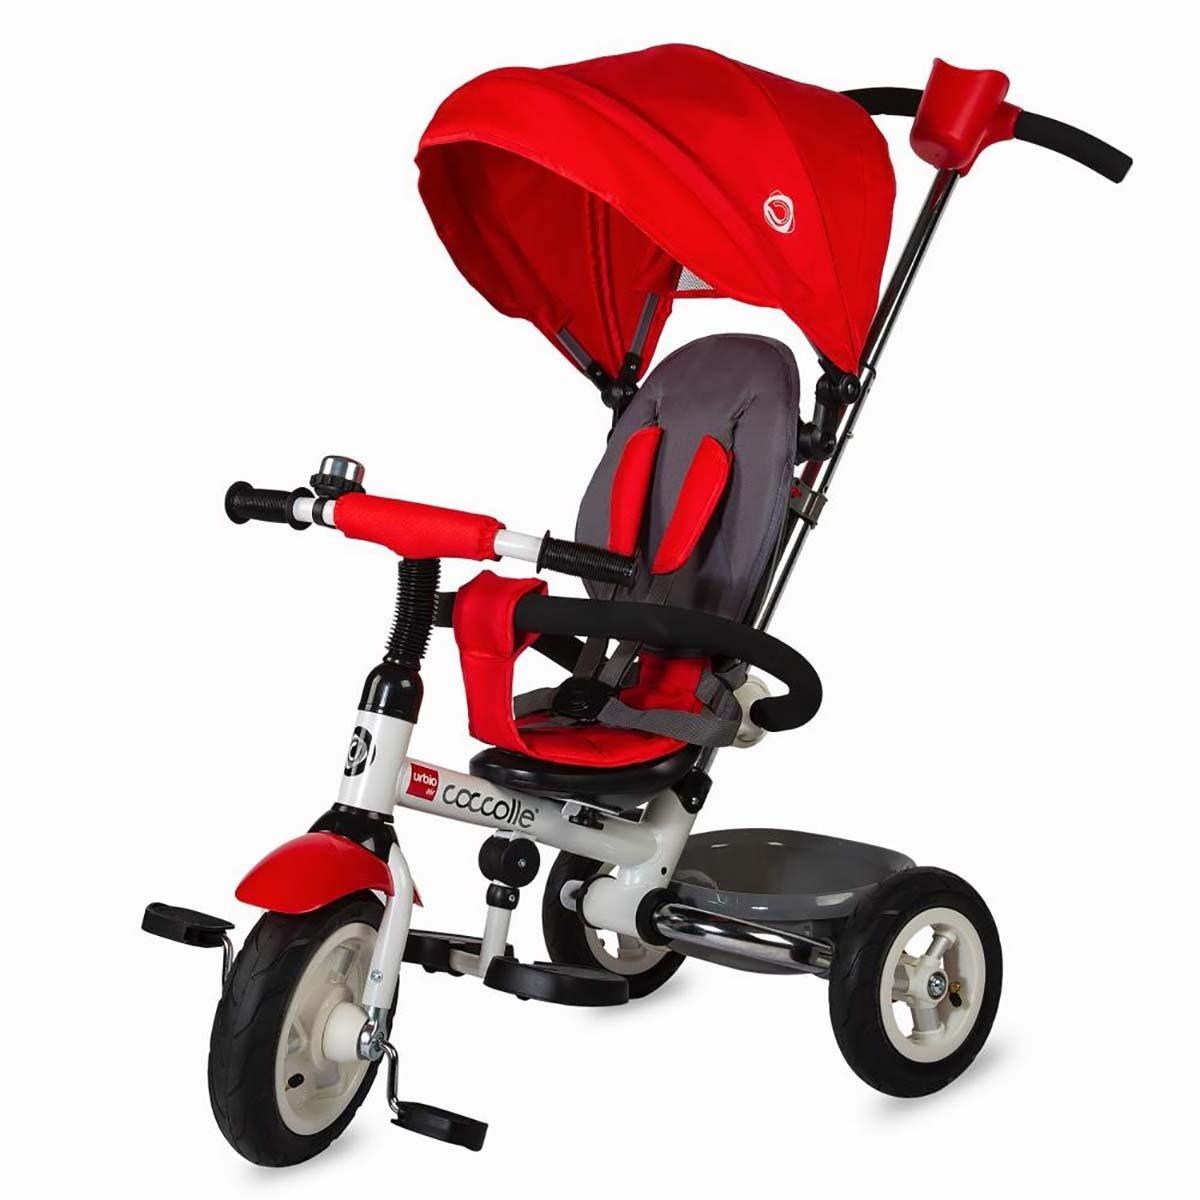 Tricicleta pliabila Urbio Air Coccolle, Rosu imagine